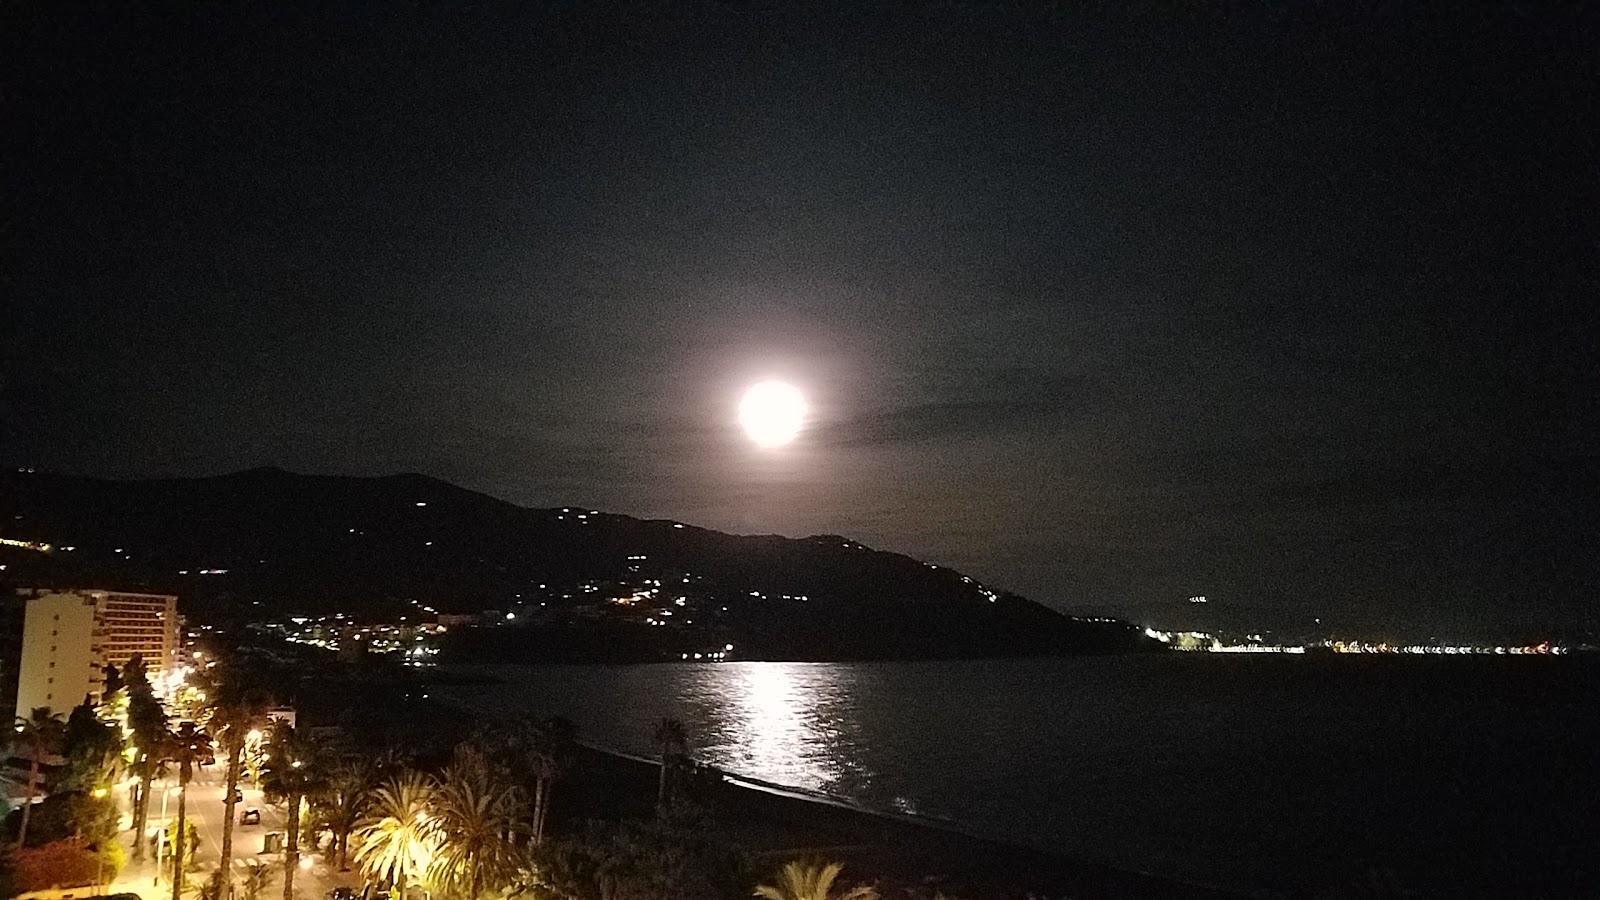 Moonrise over Salobrena